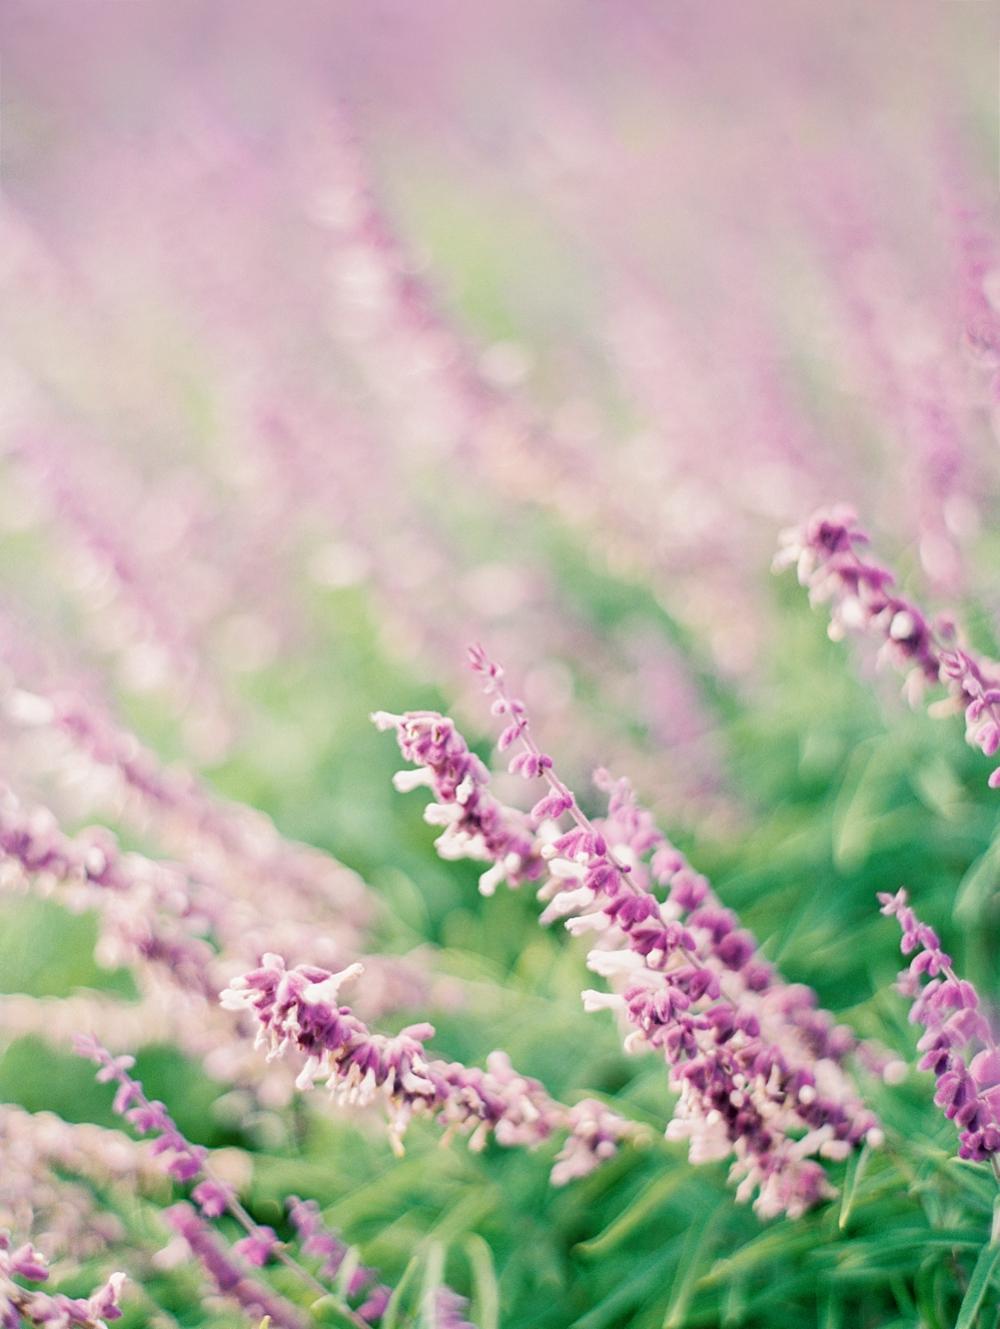 kristin-la-voie-photography-Dallas-Botanical-Garden-Arboretum-Engagement-fine-art-wedding-photographer-3